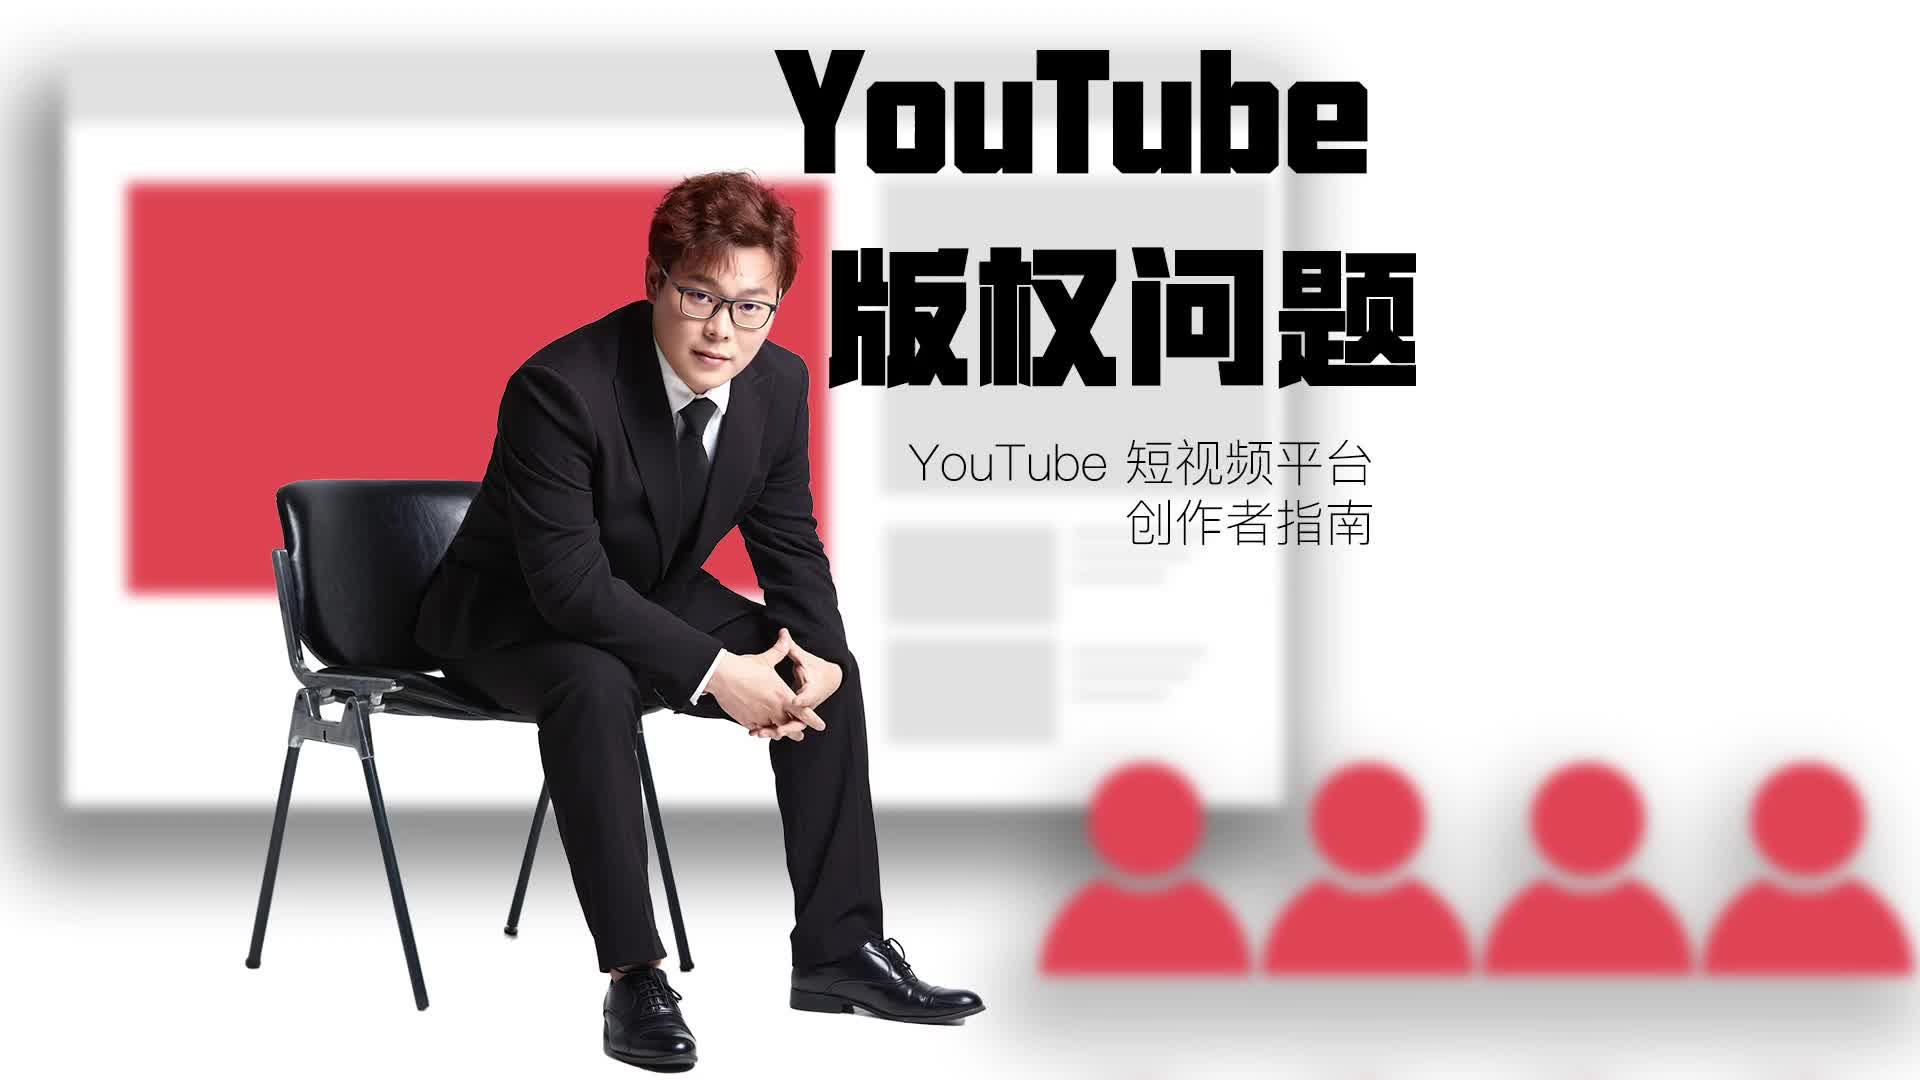 YouTube版权 收到版权主张怎么办?